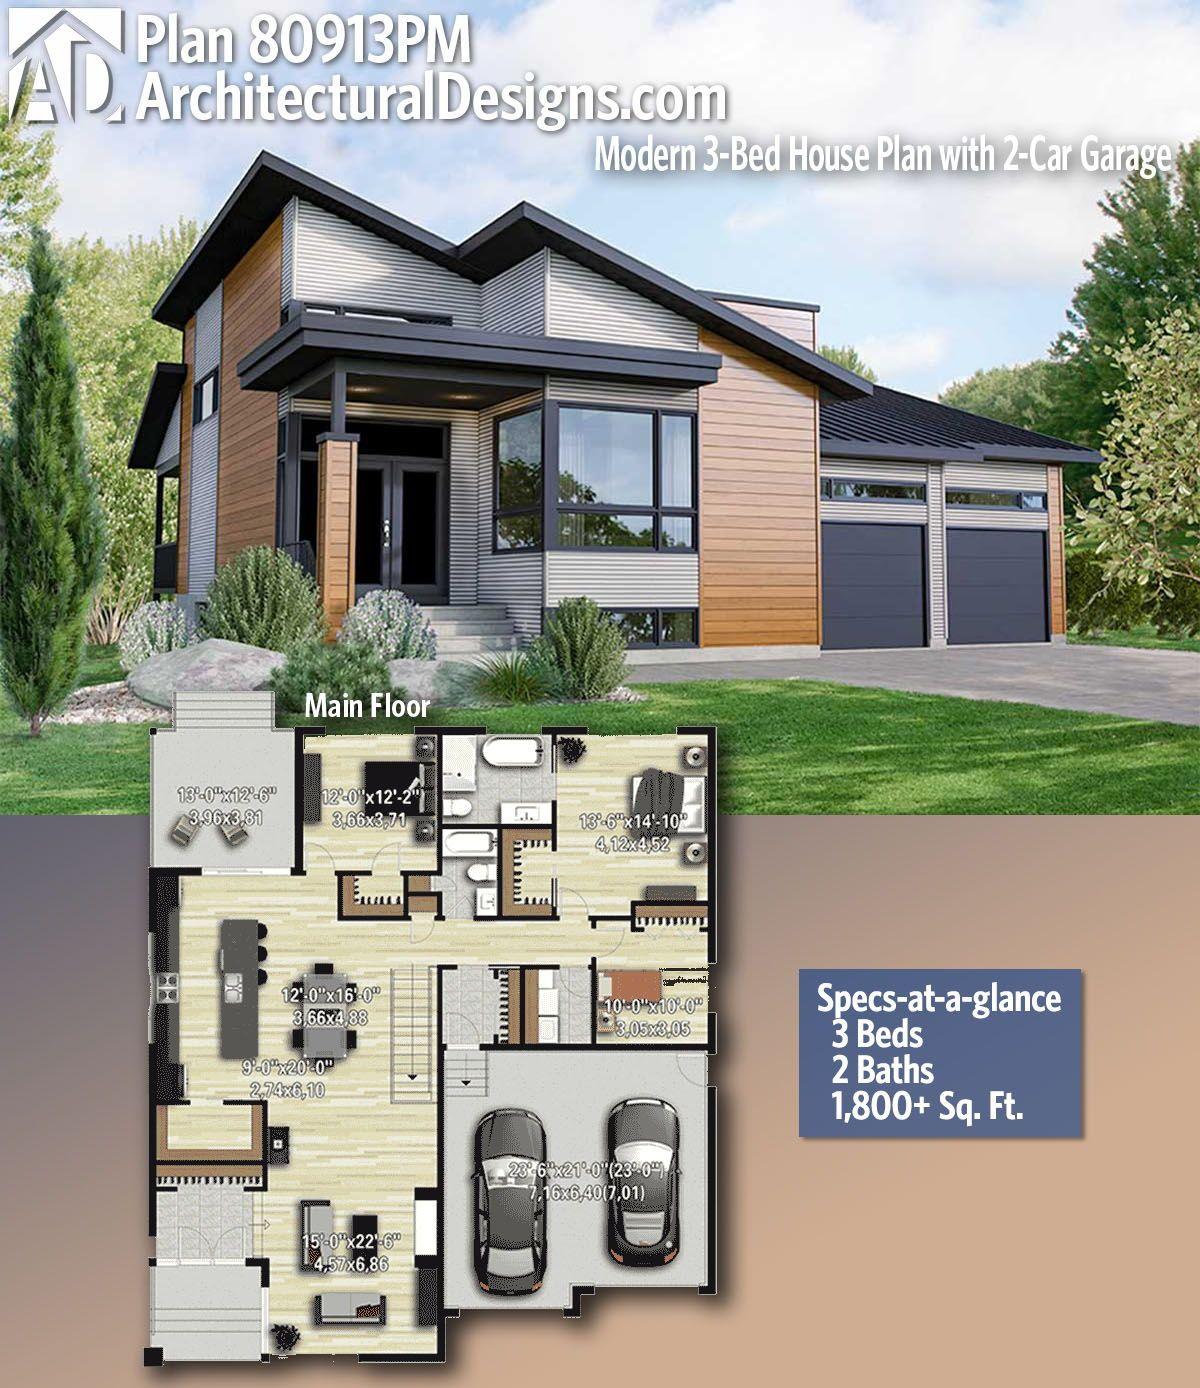 Plan 80913pm Modern 3 Bed House Plan With 2 Car Garage Small Modern House Plans Modern House Plans House Plans